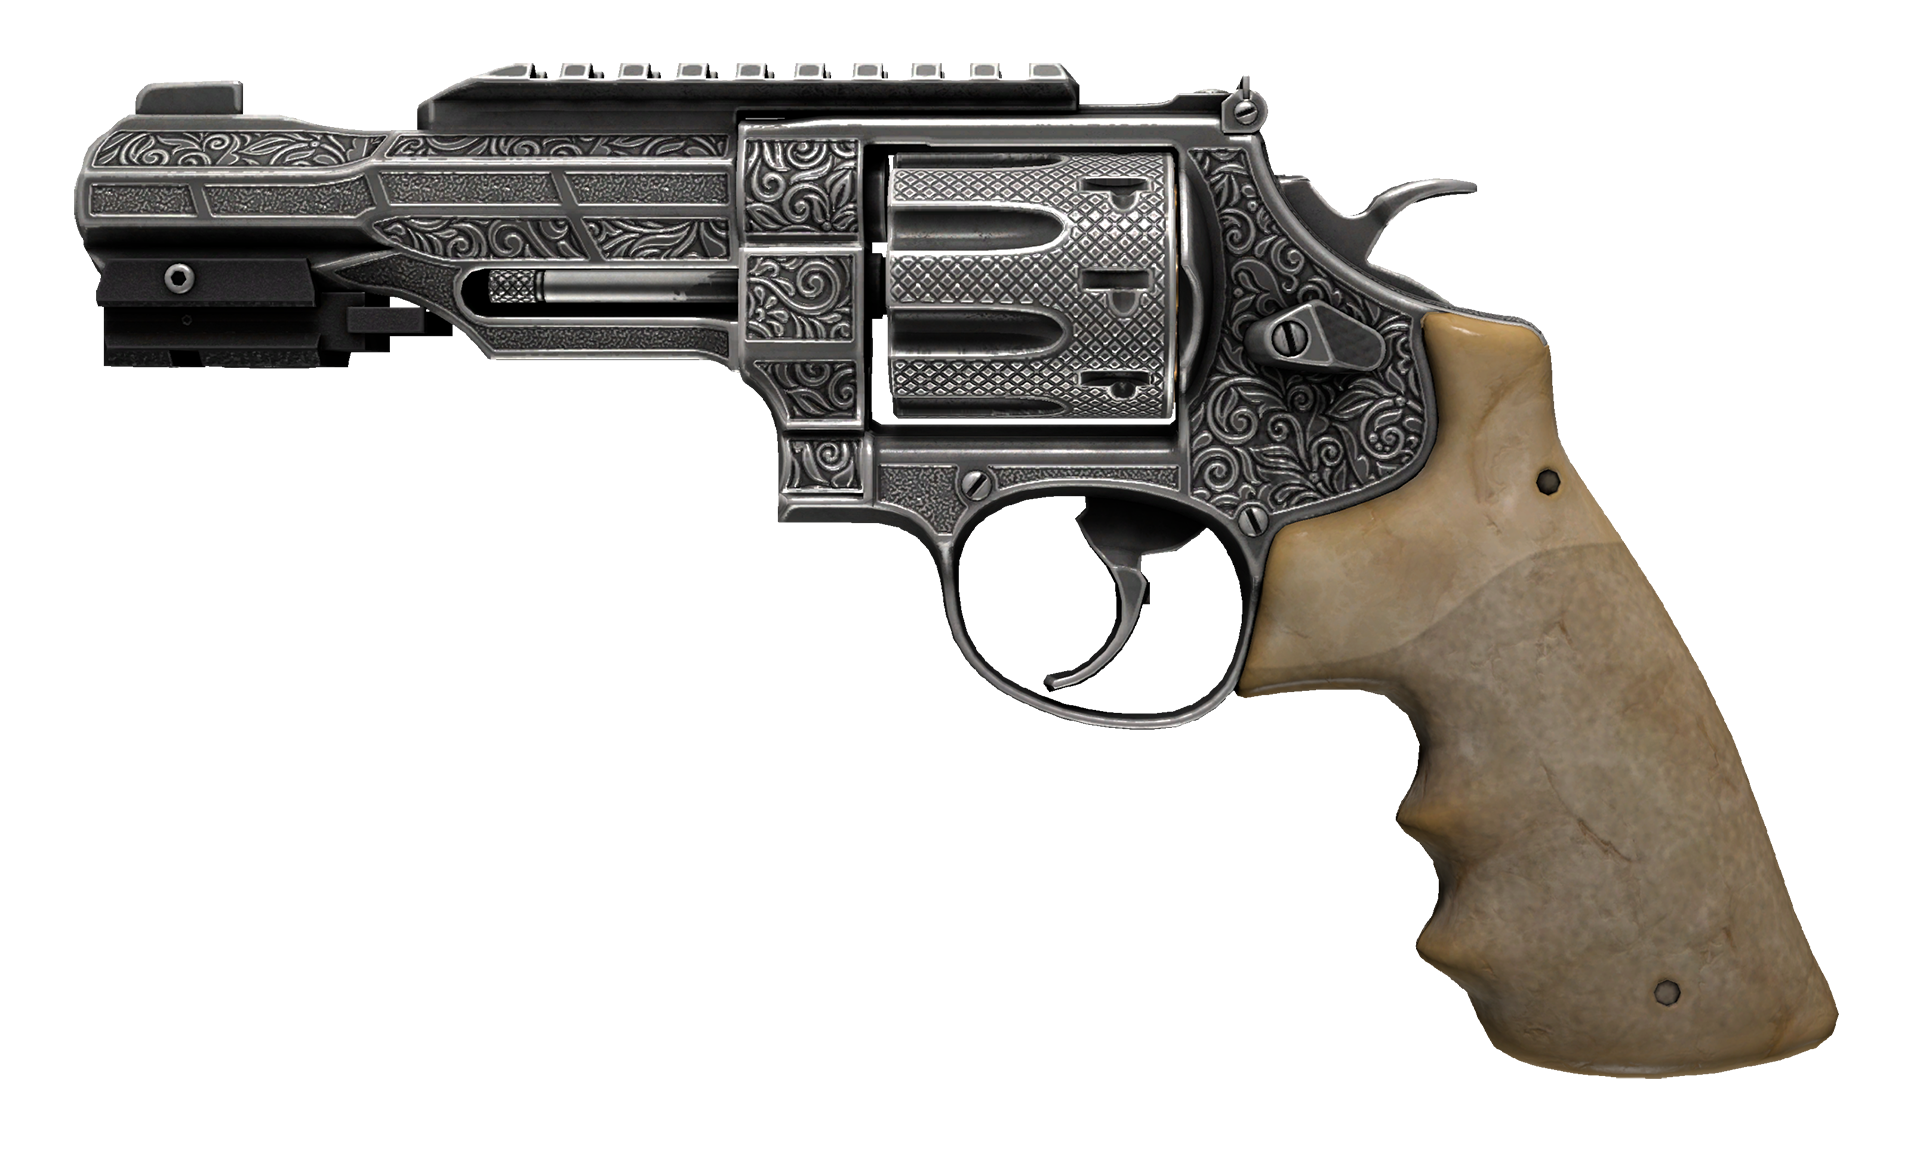 R8 Revolver Memento Large Rendering